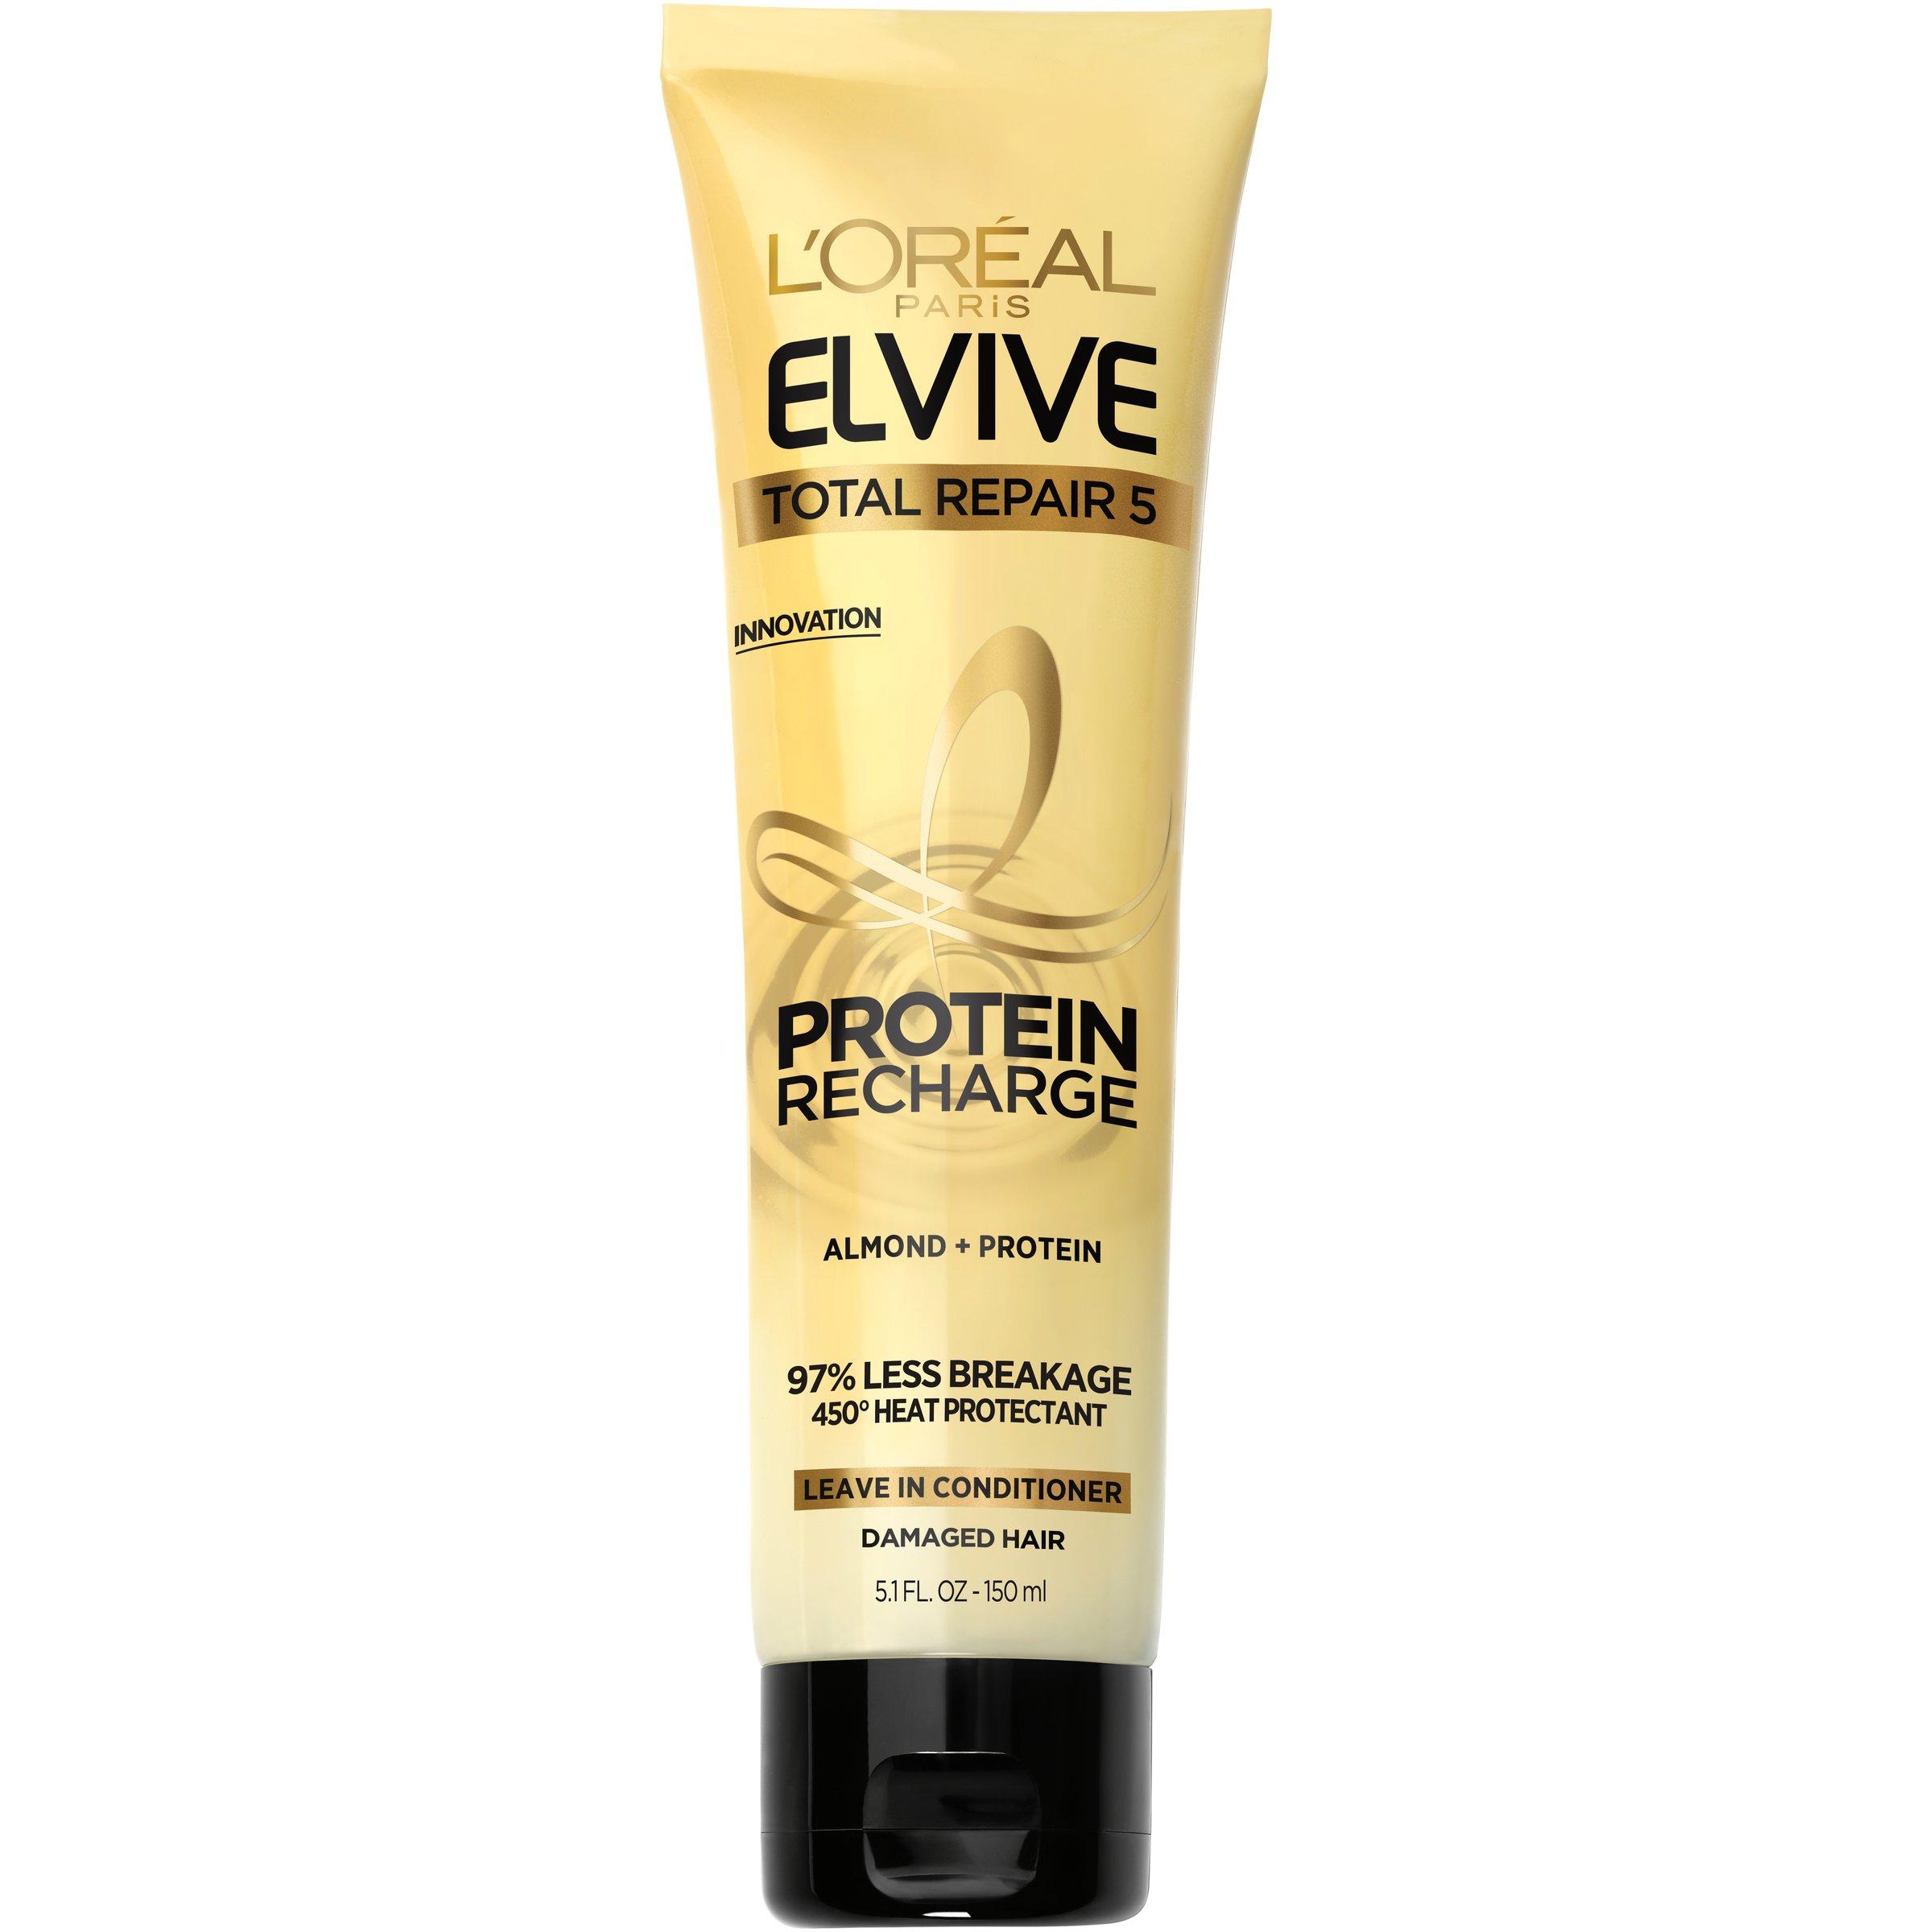 L'Oréal Paris Elvive Total Repair 5 Protein Recharge Treatment, 5.1 fl. oz. (Packaging May Vary)